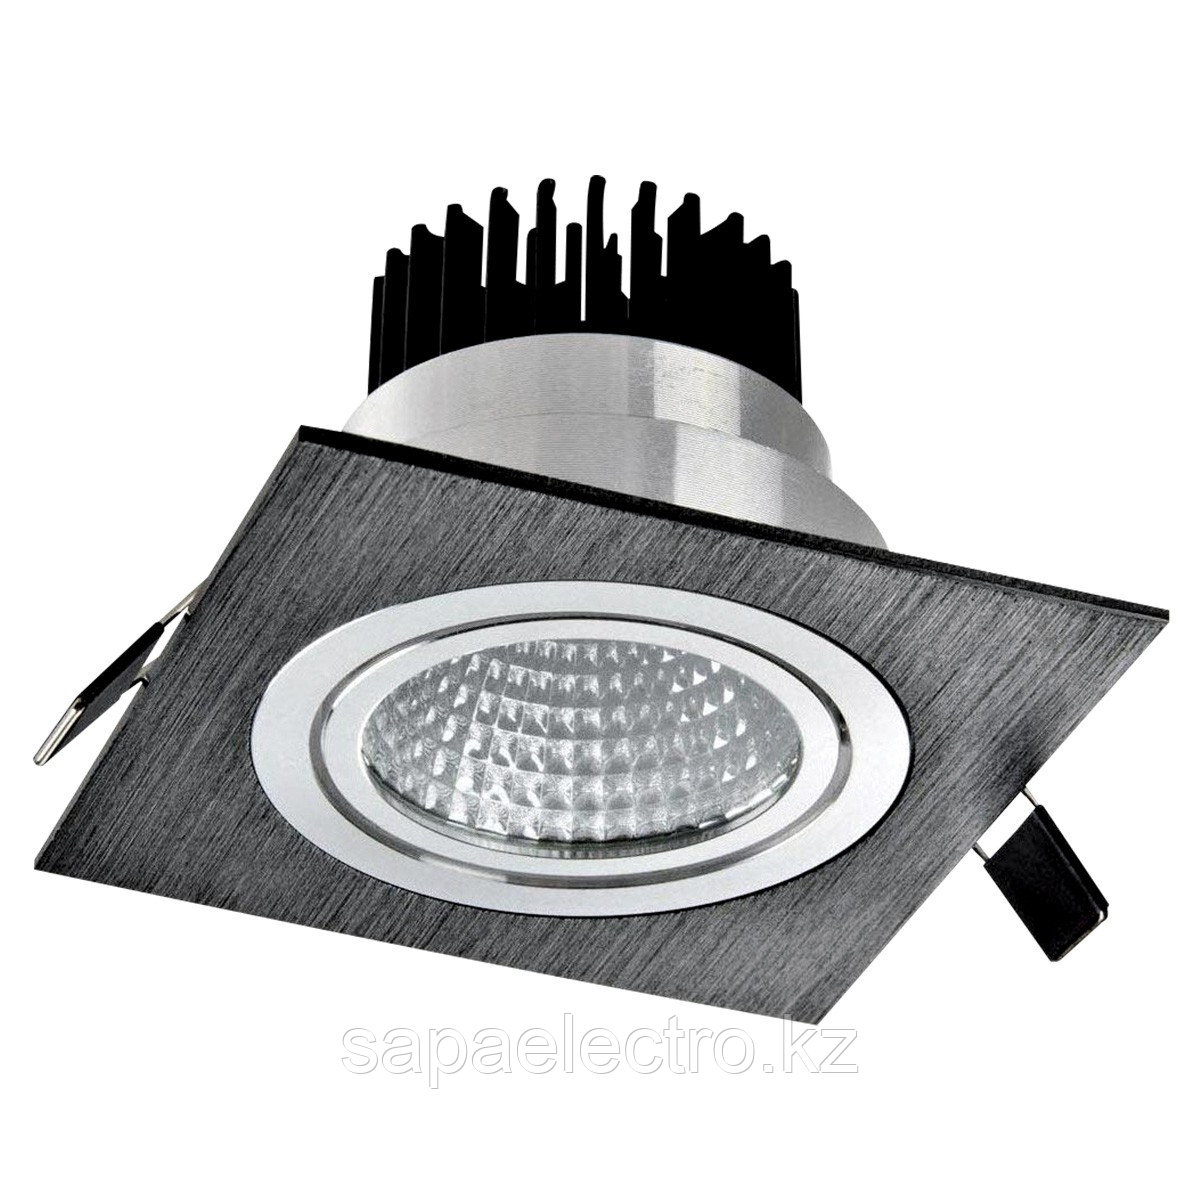 Свет-к LED OC002A 1х5W 5000K BLACK (TS) 50шт